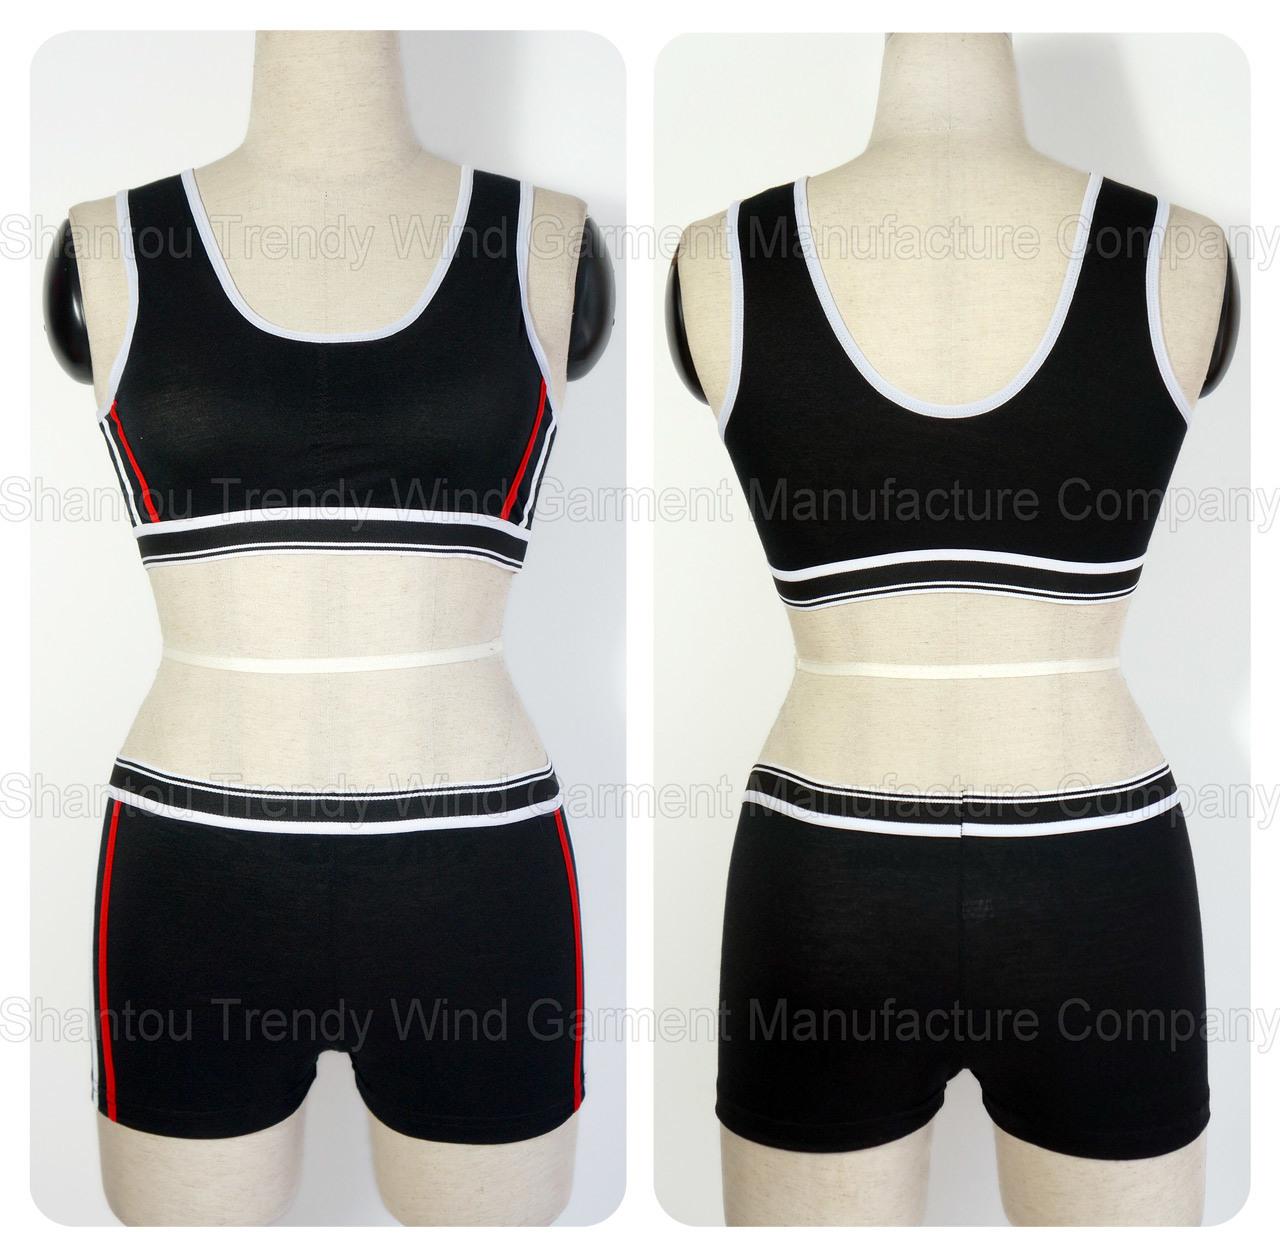 83cebdc46bd Bralette Panty Sports Bra  Genie Bra Babydoll Underwear Push up Bra ...